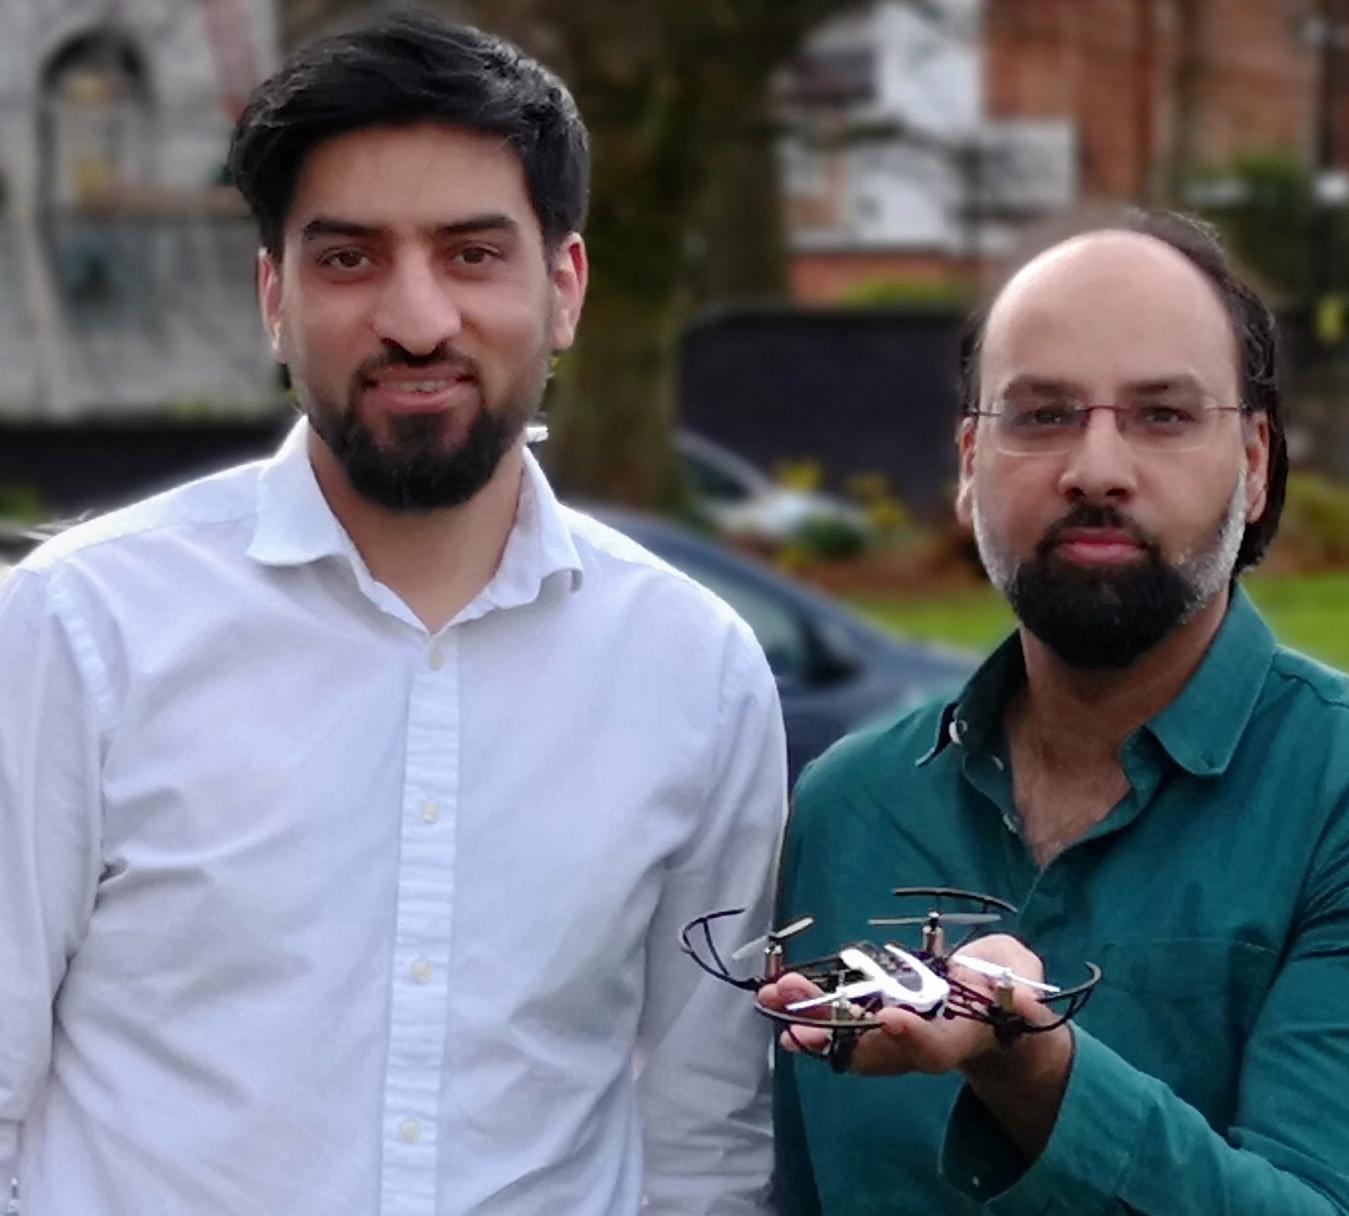 British Robotics Seed Fund invests in Birmingham app developers Redbeard